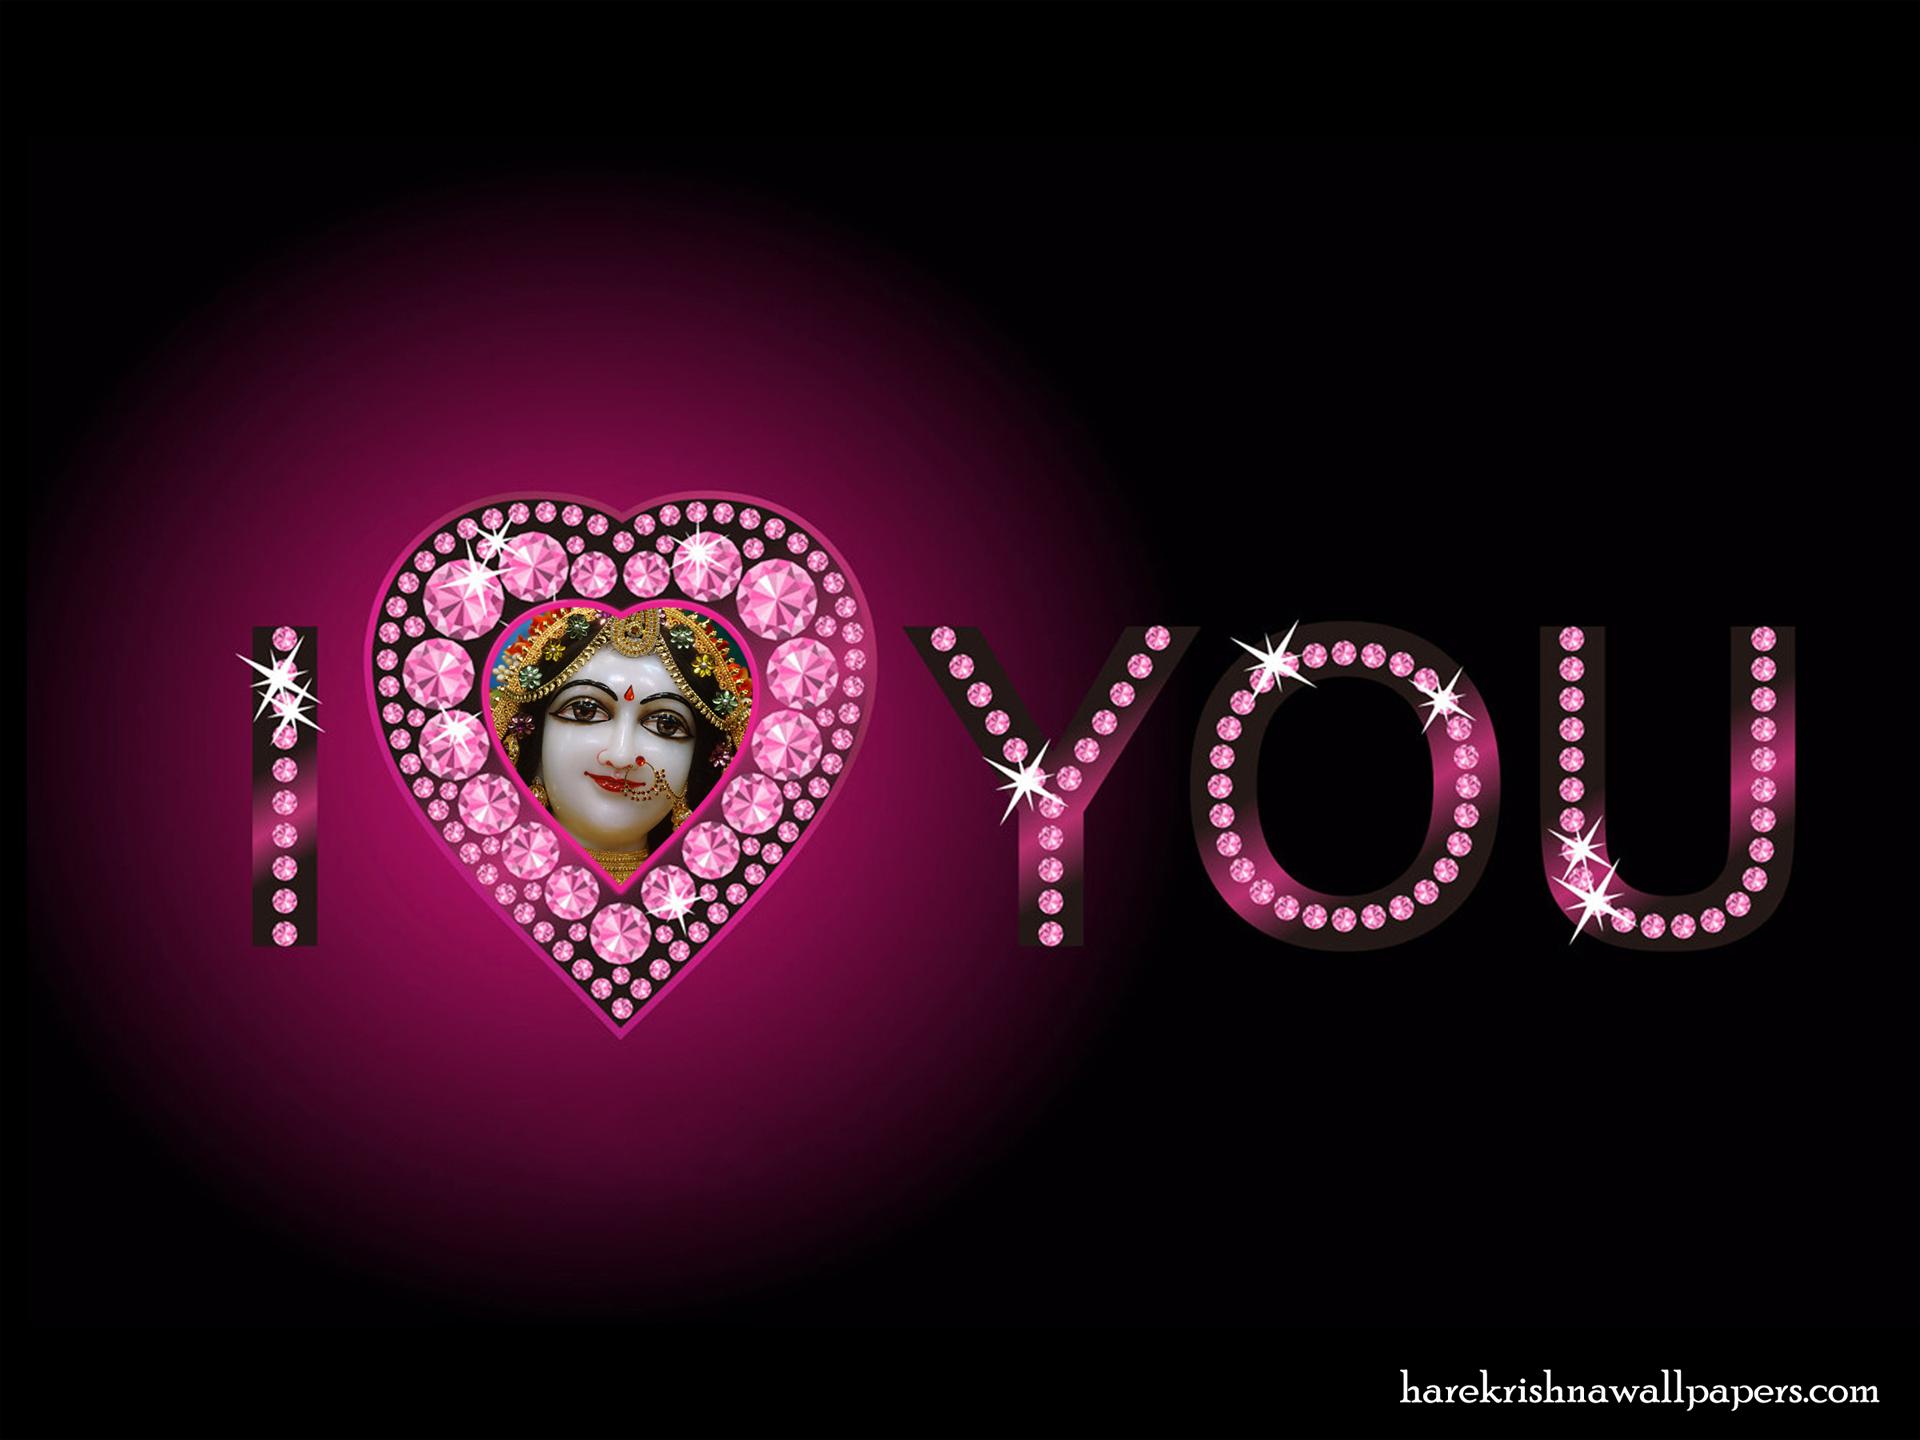 I Love You Radharani Wallpaper (012) Size 1920x1440 Download